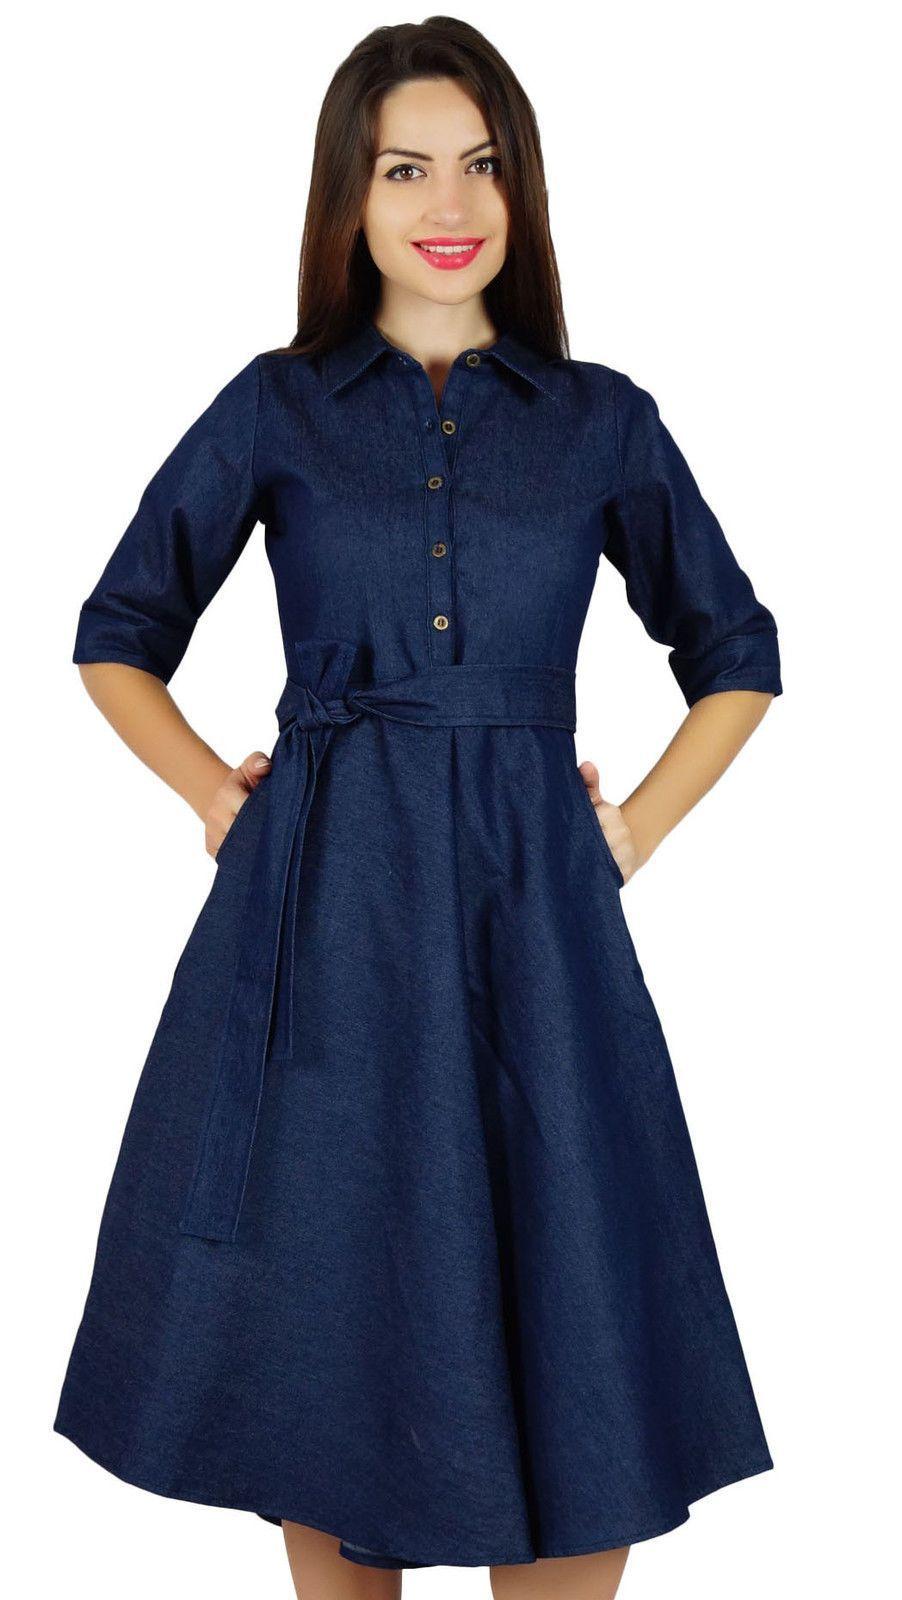 9d63357e12e Bimba Womens Blue Denim Shirt Dress With Pockets 3 4 Sleeve Casual Midi  Dress